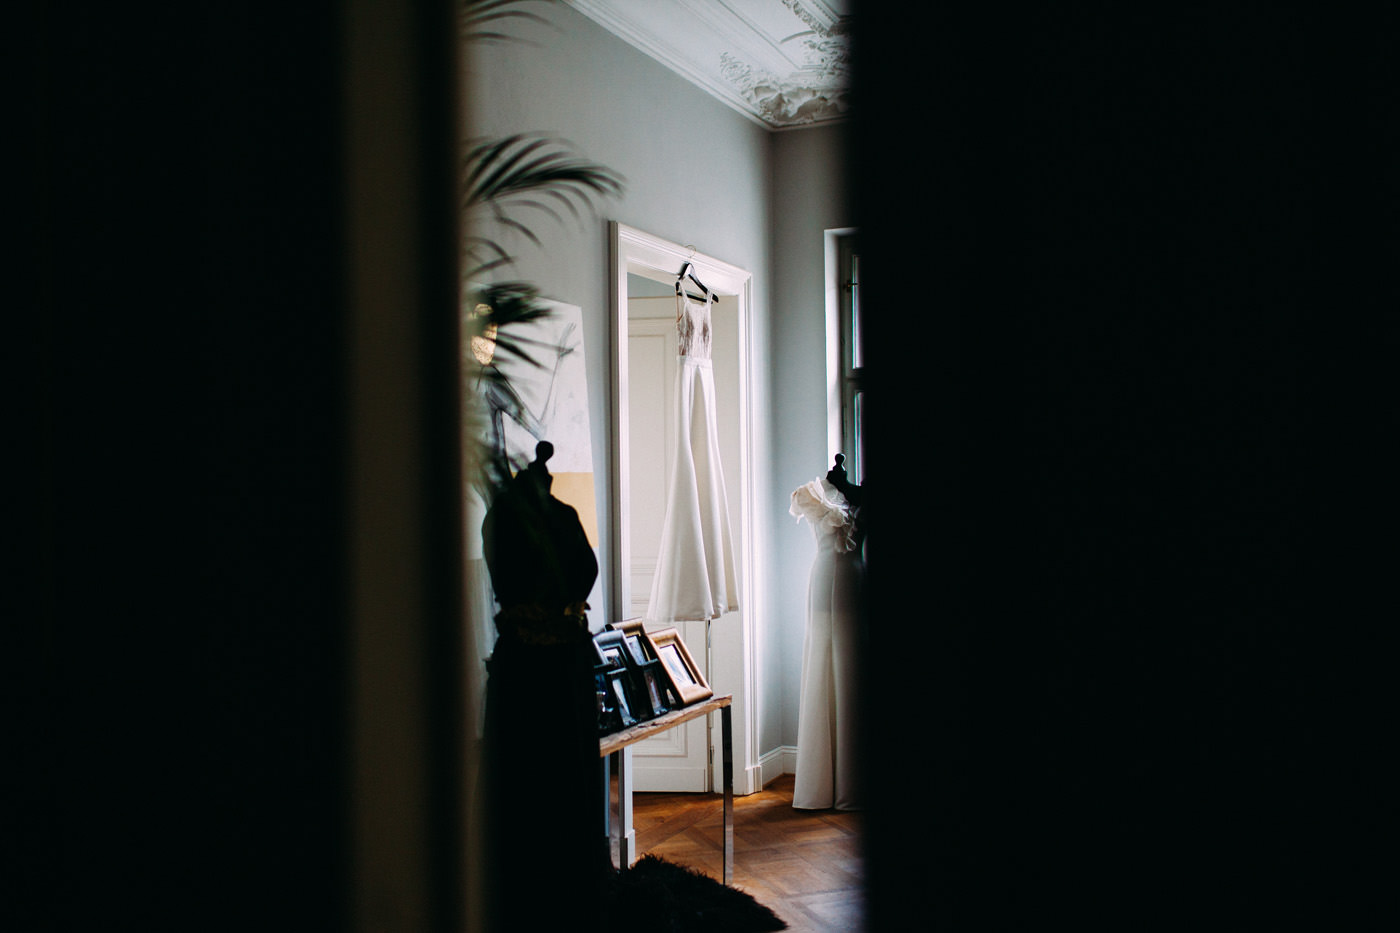 suknia slubna od robert czerwik- wesele amber room warszawa- luke sezeck